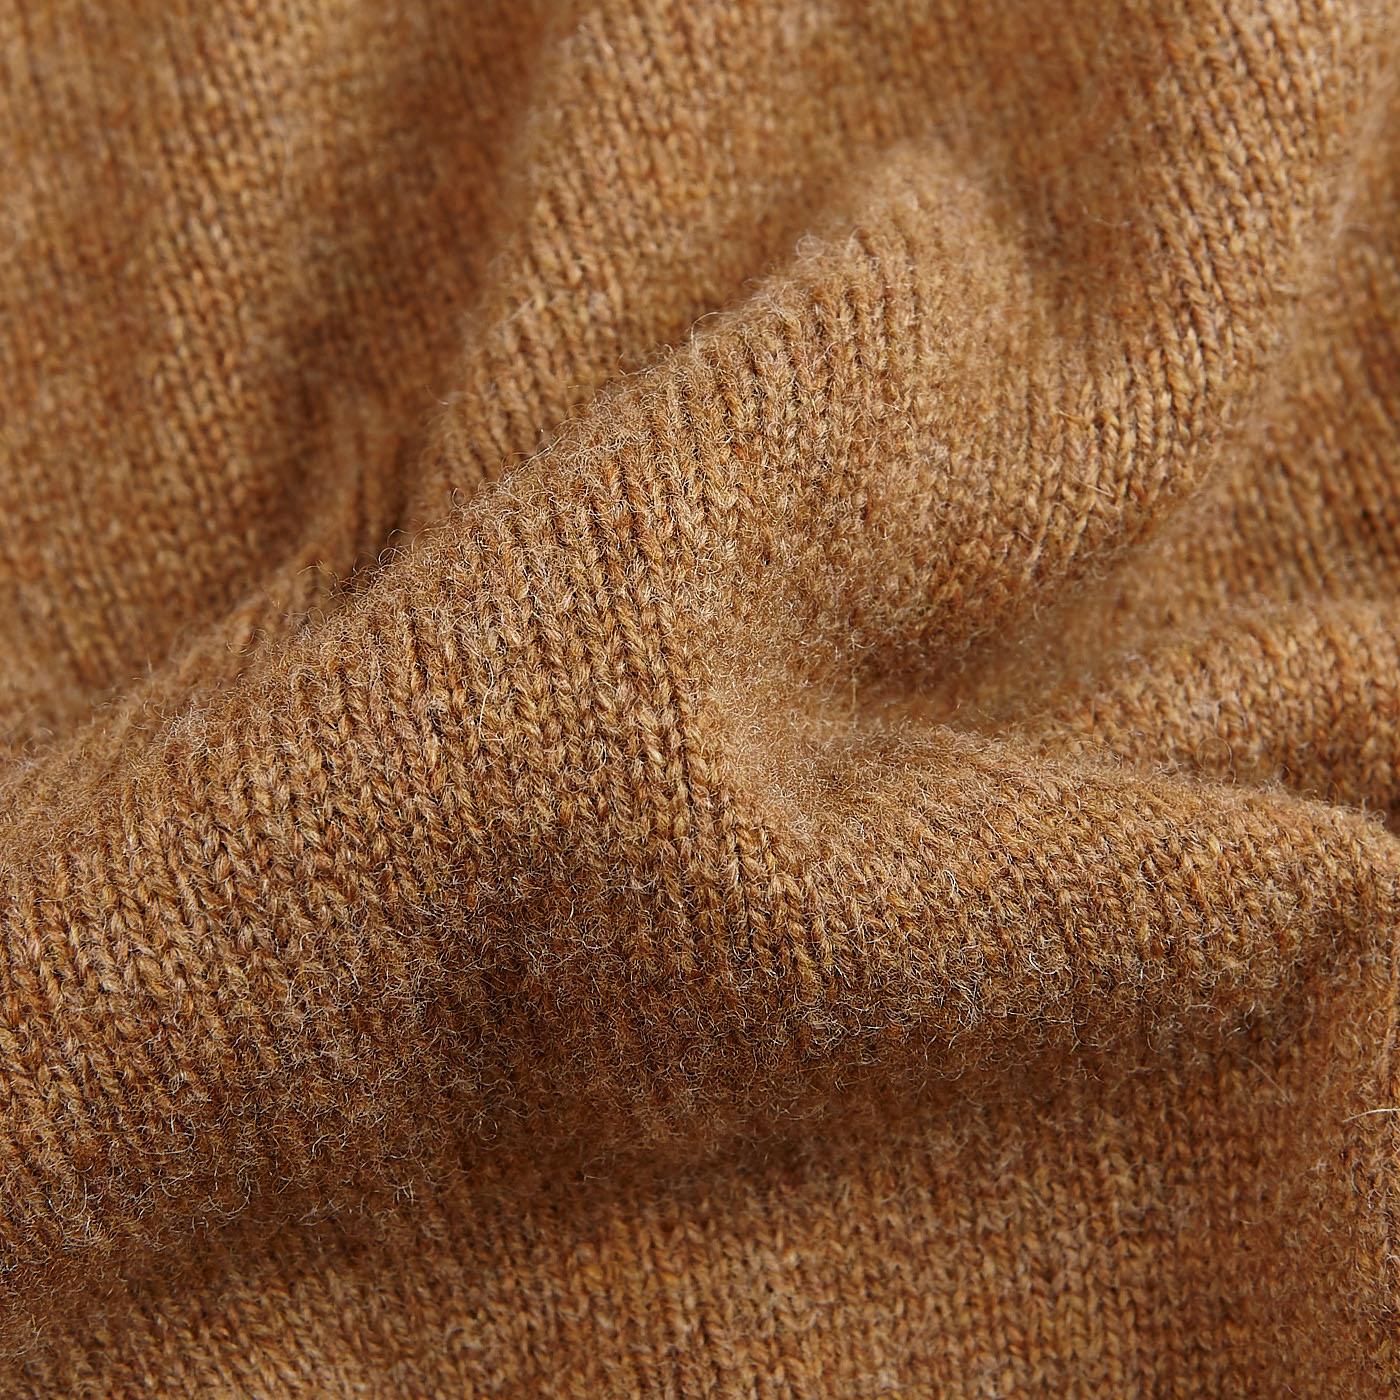 William Lockie Savannah Brown Lambswool Cardigan Fabric